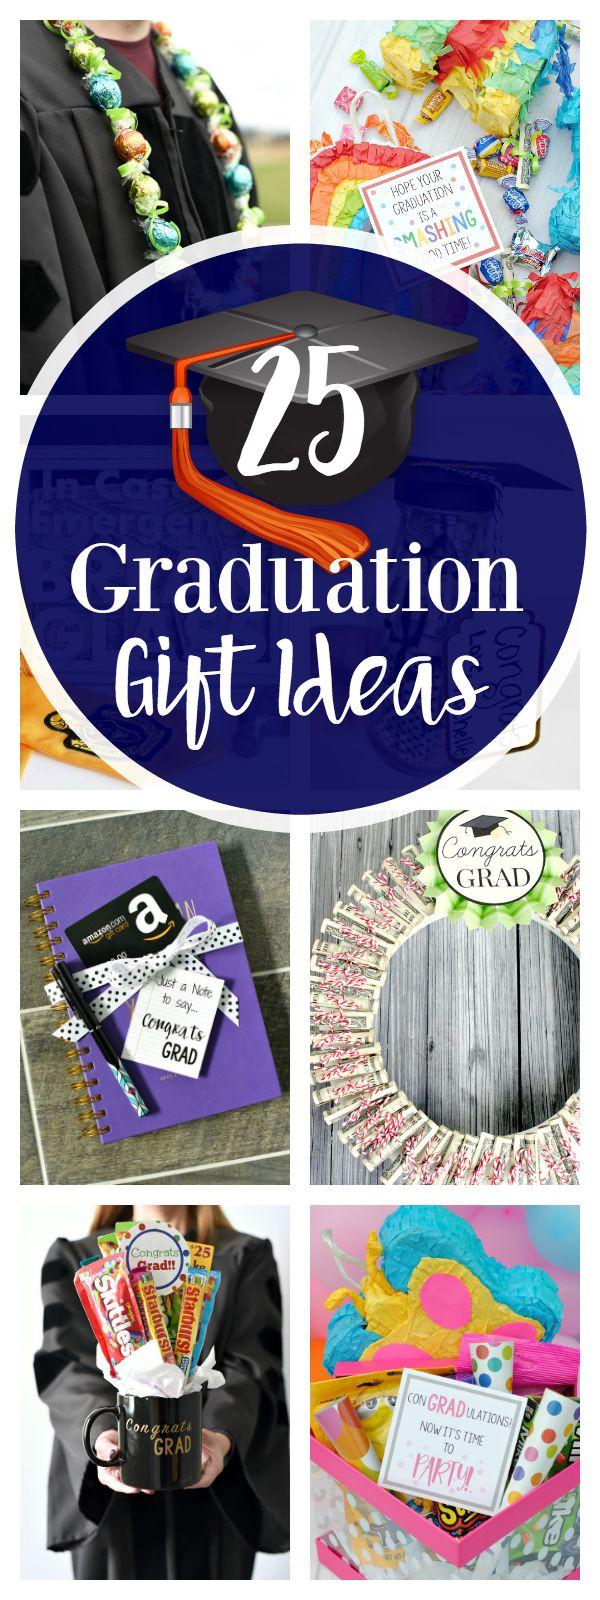 Best Graduation Gift Ideas  Best 25 Graduation ts ideas on Pinterest